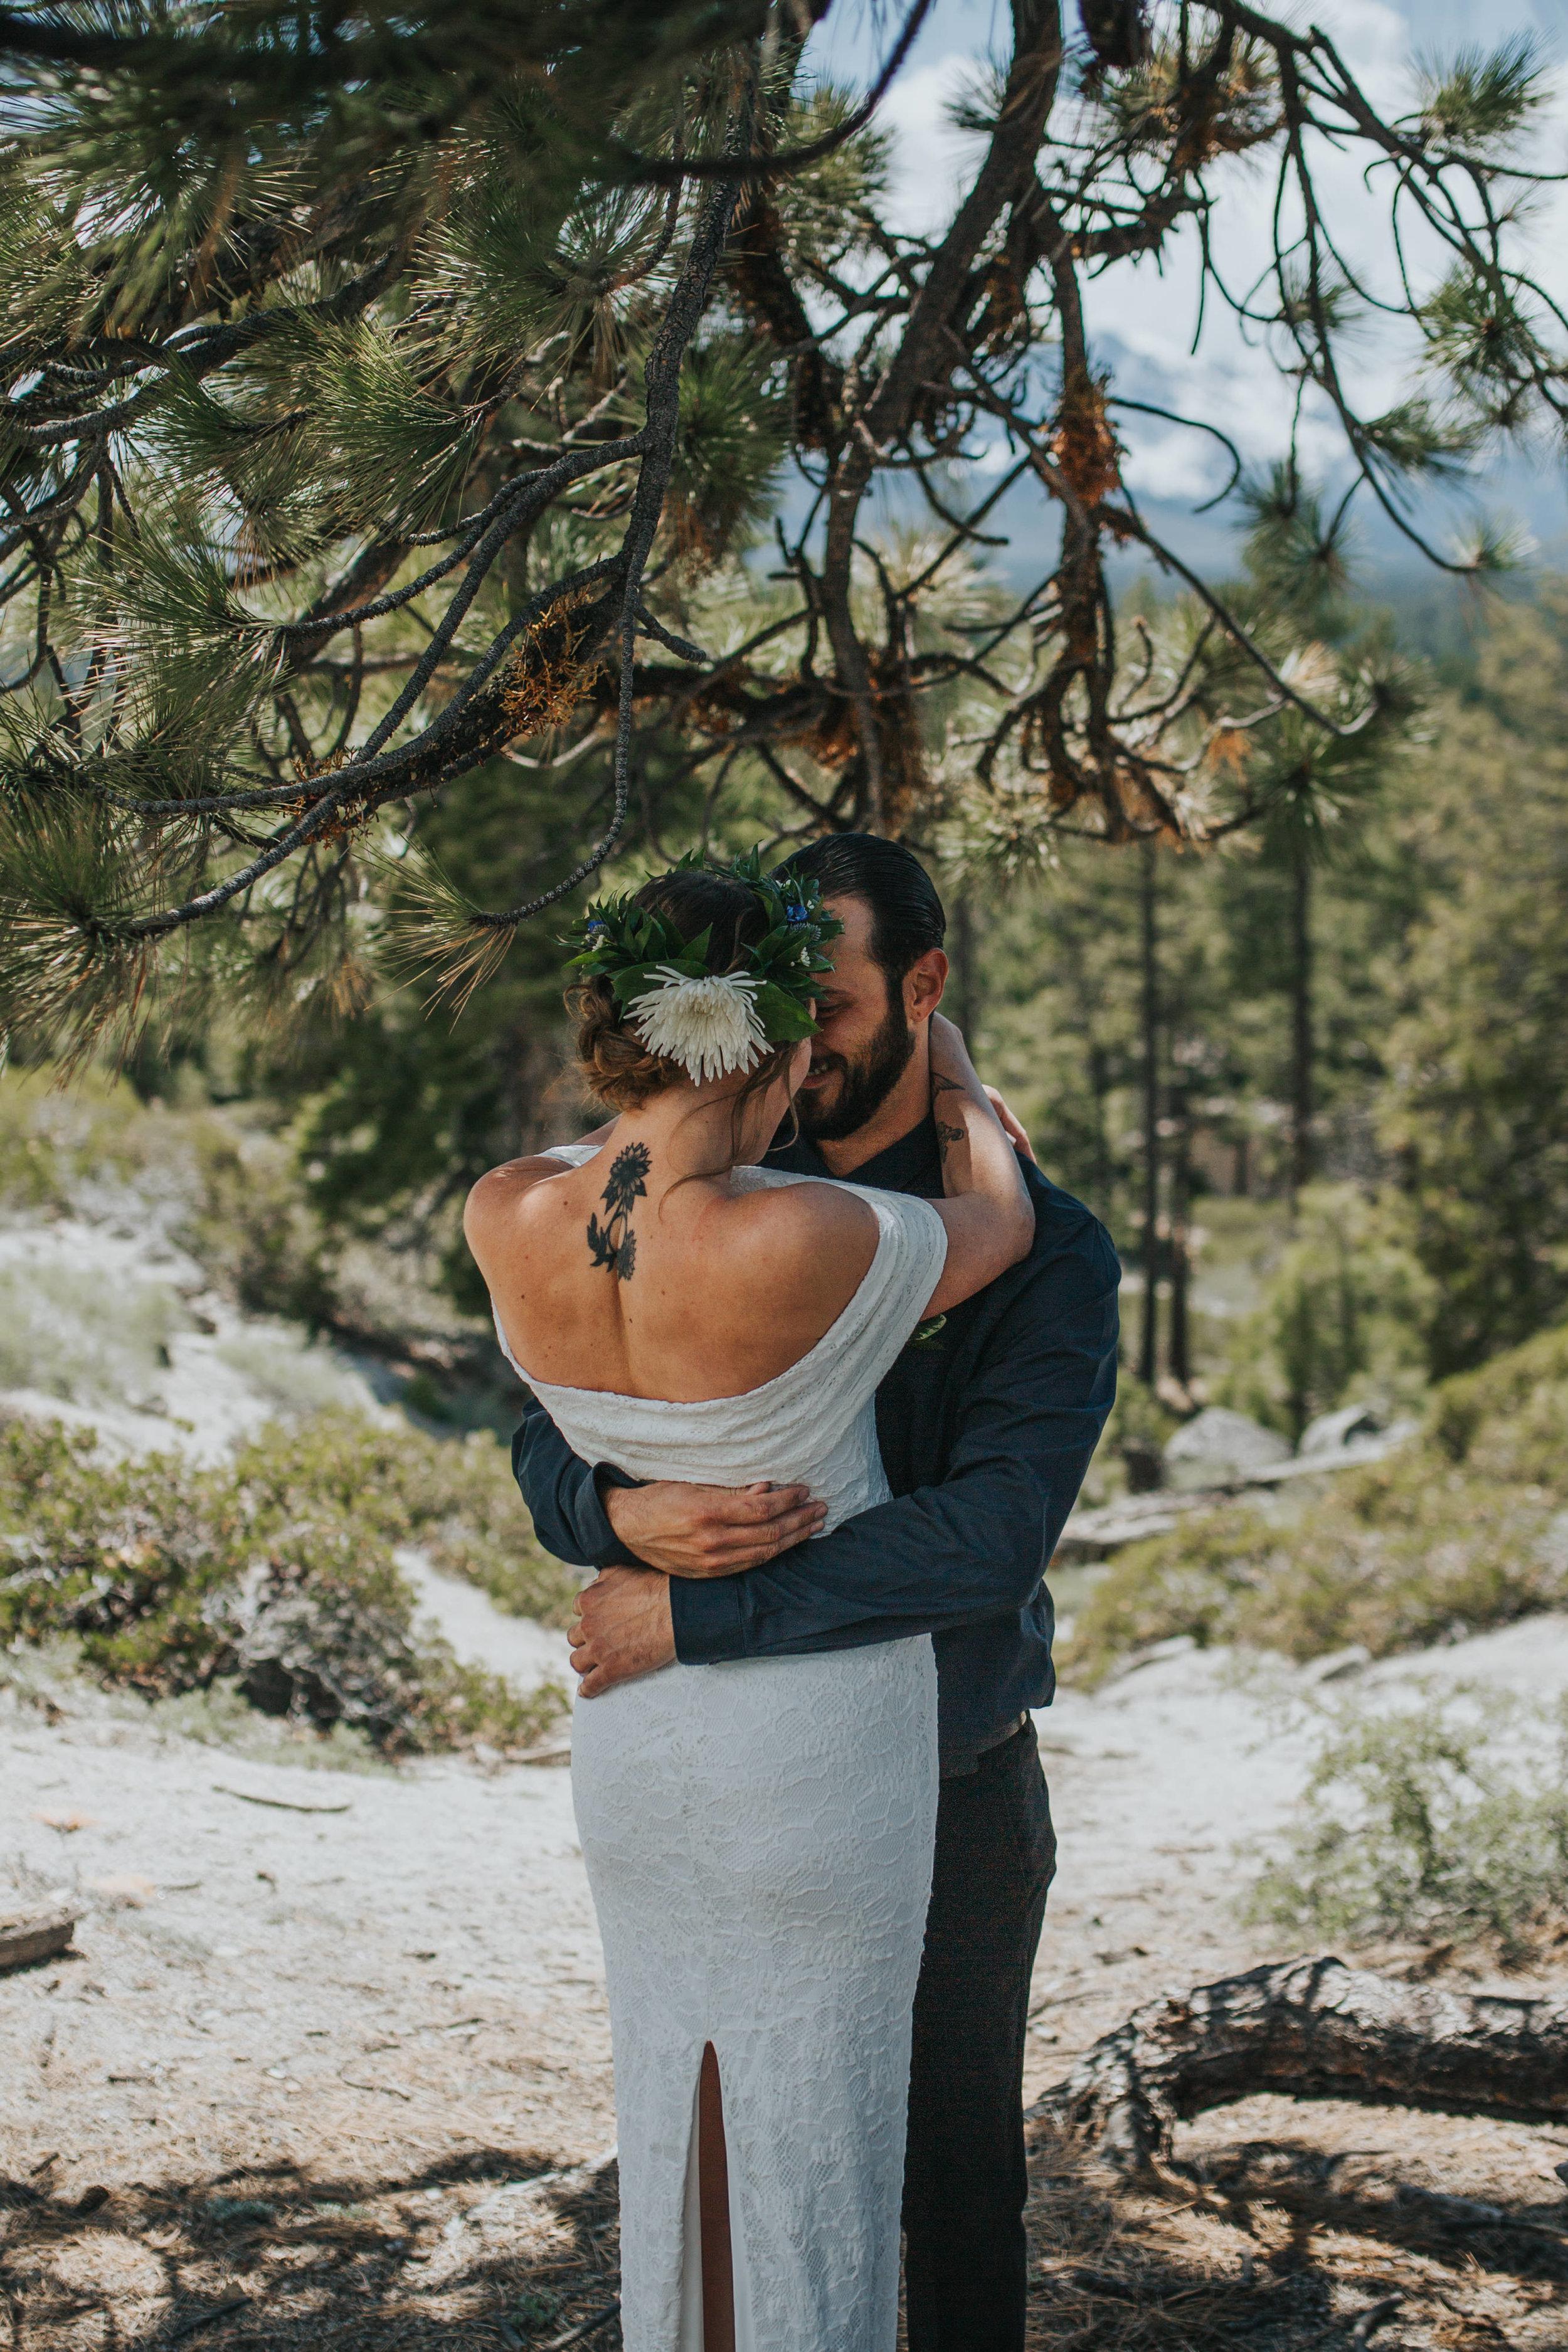 south-lake-tahoe-elopement-valerie-lendvay-photo-014.jpg